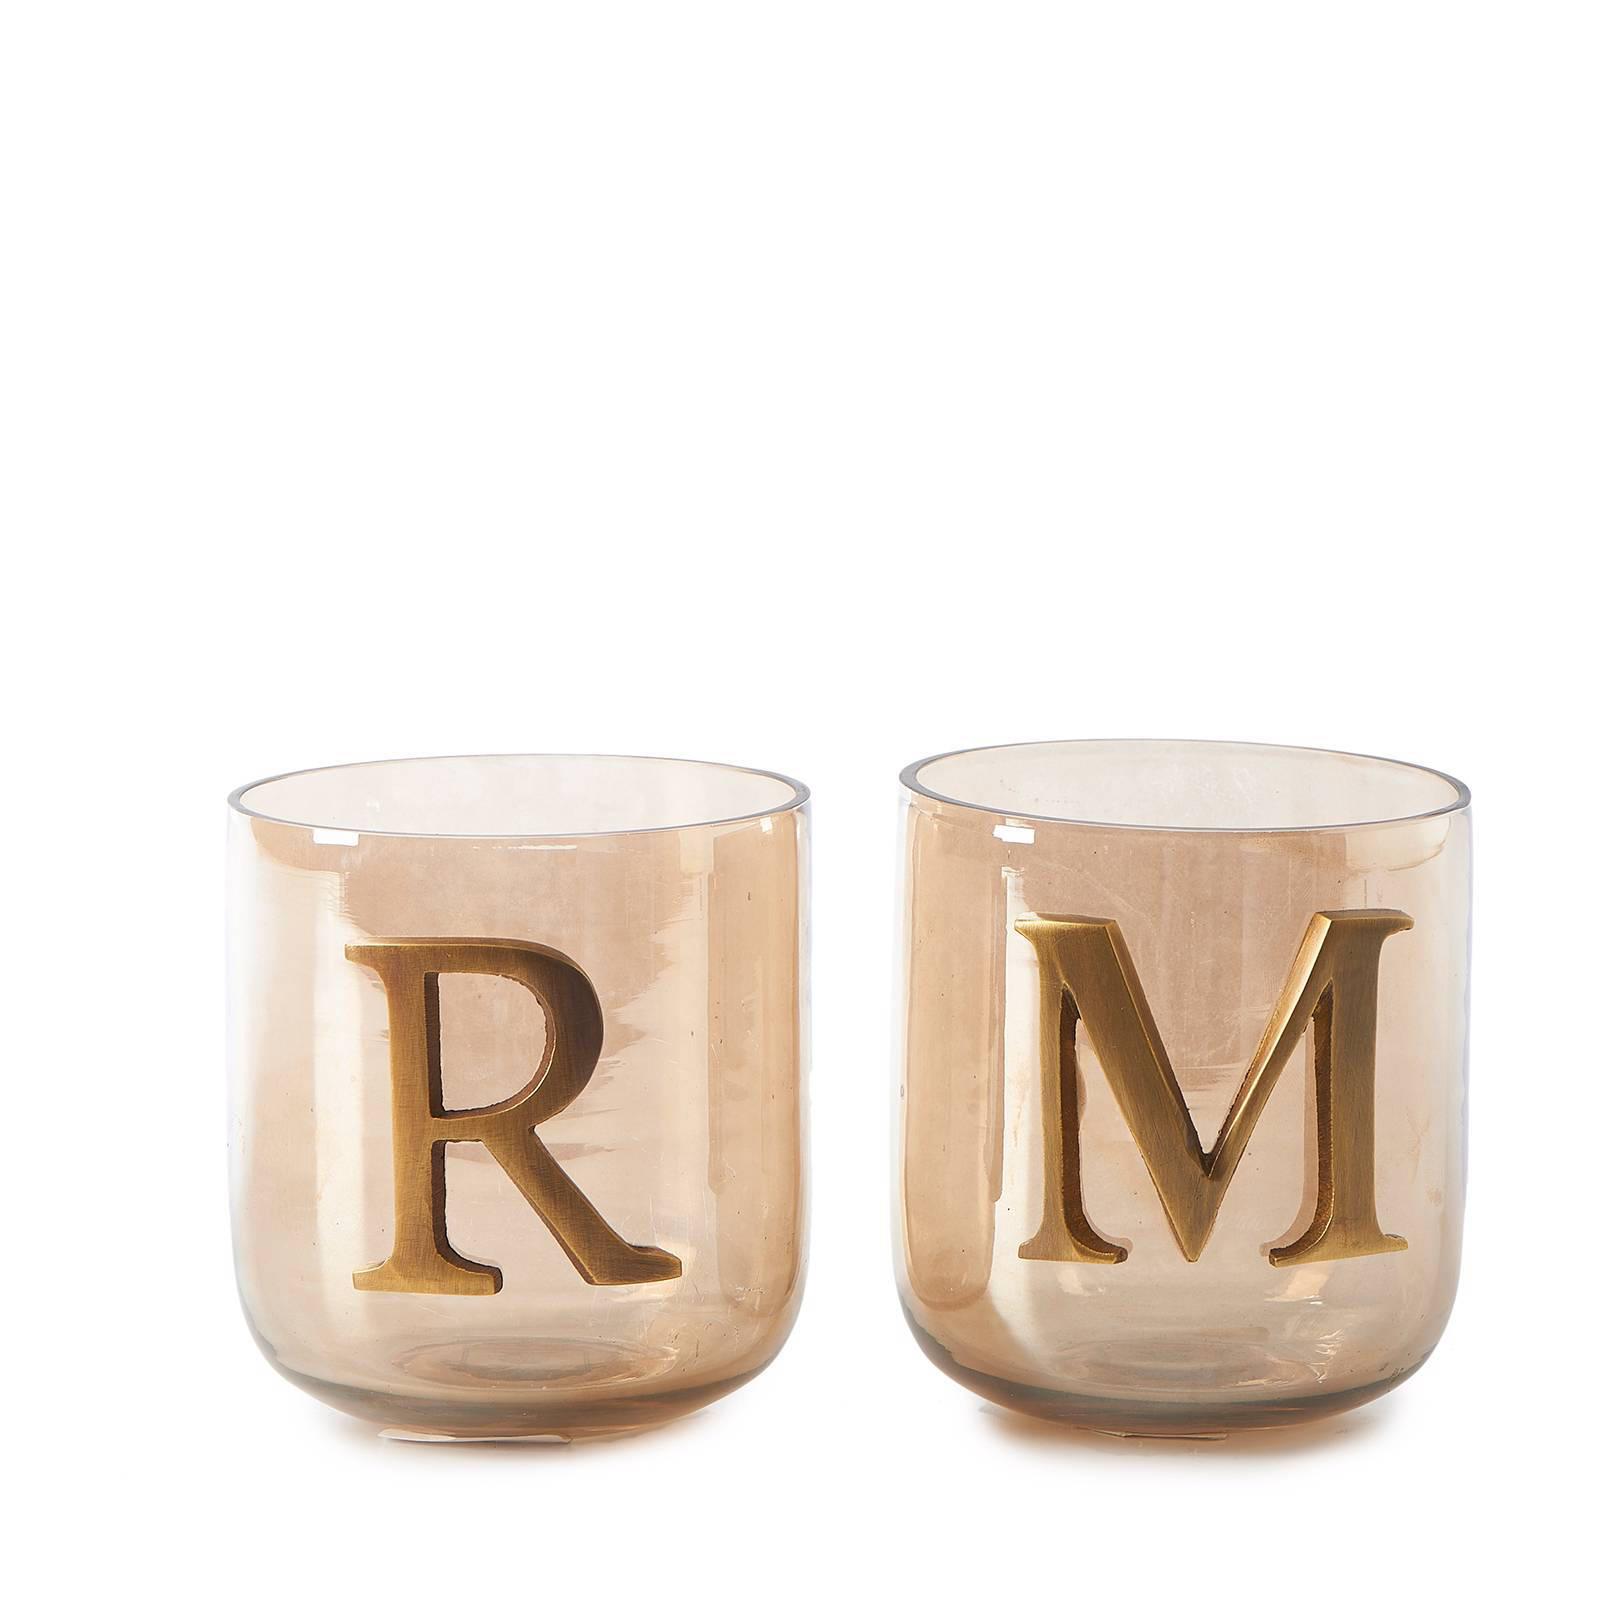 Vaak Riviera Maison waxinelichthouder RM Letter (set van 2) | wehkamp &OV77